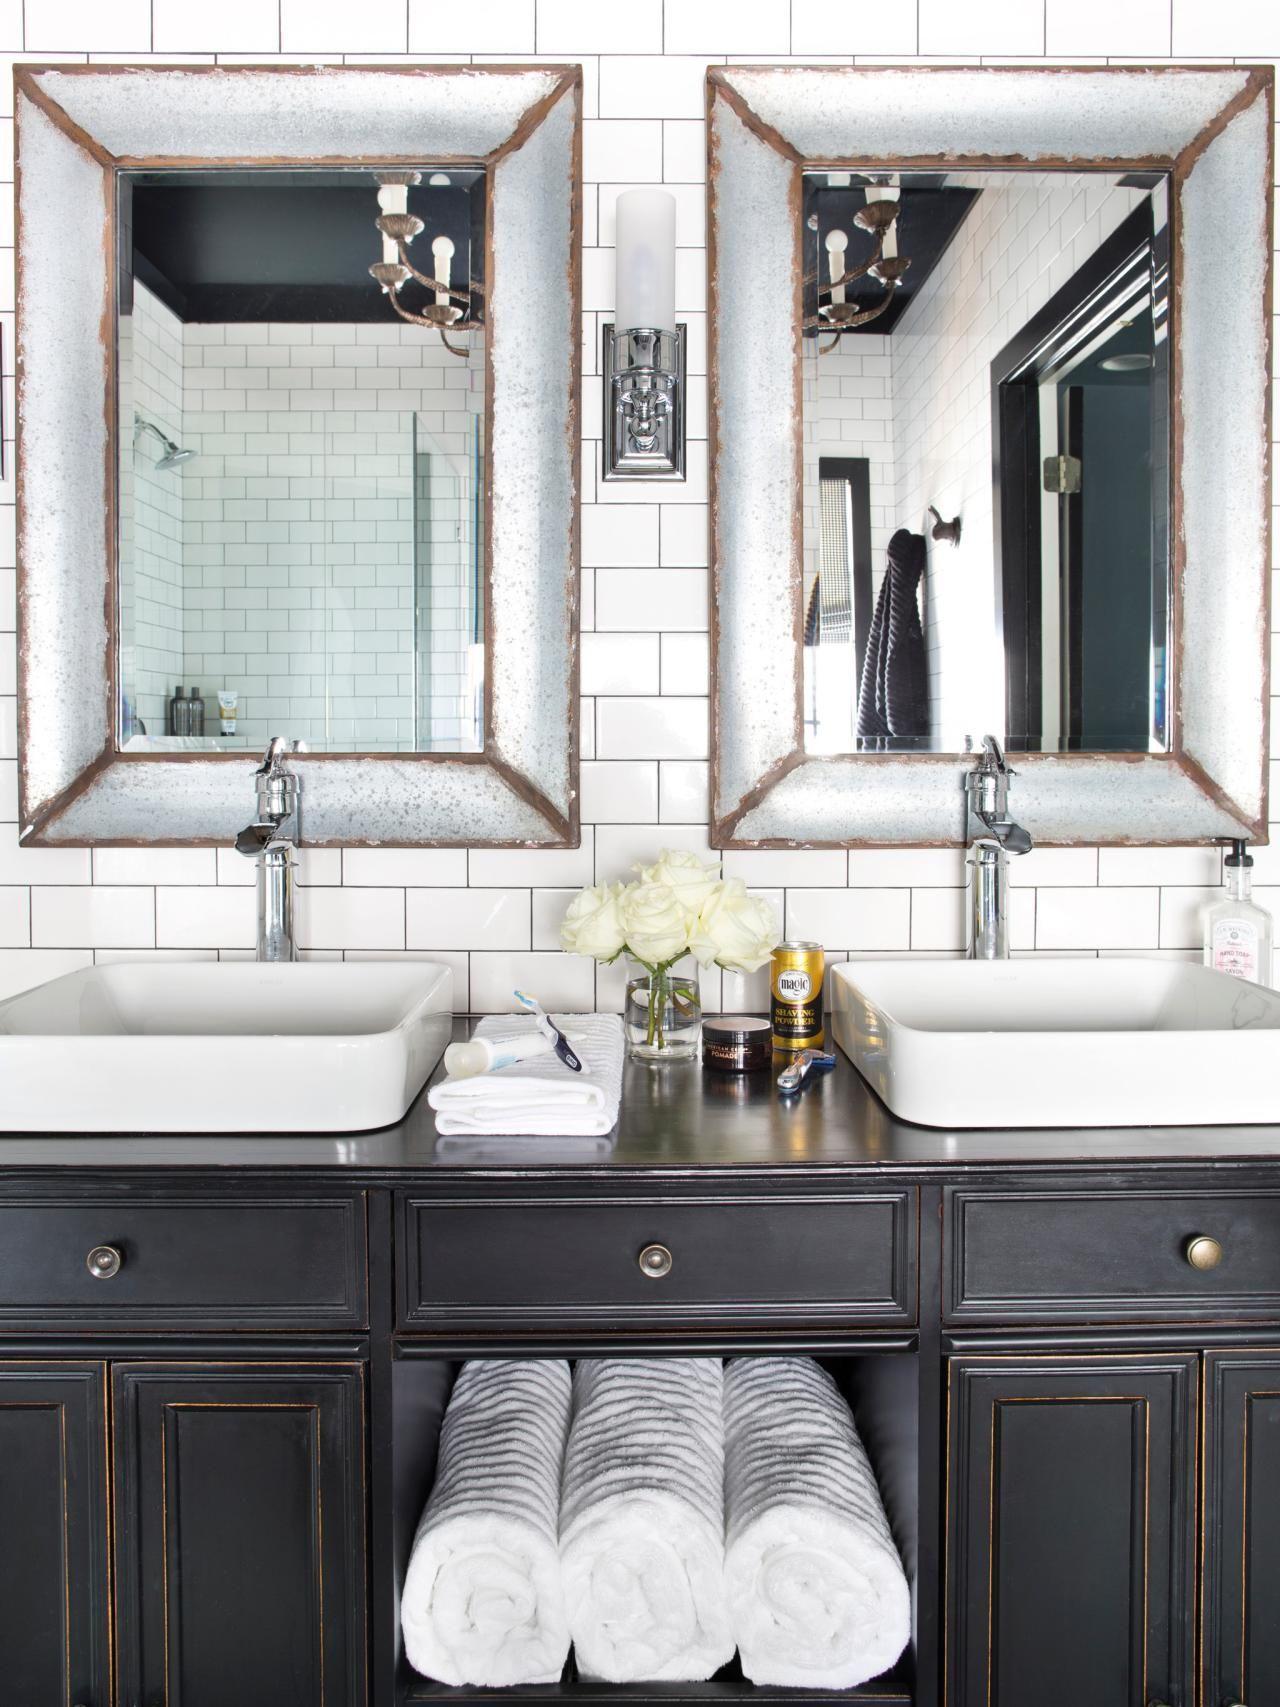 Timeless Black and White Master Bathroom Makeover The